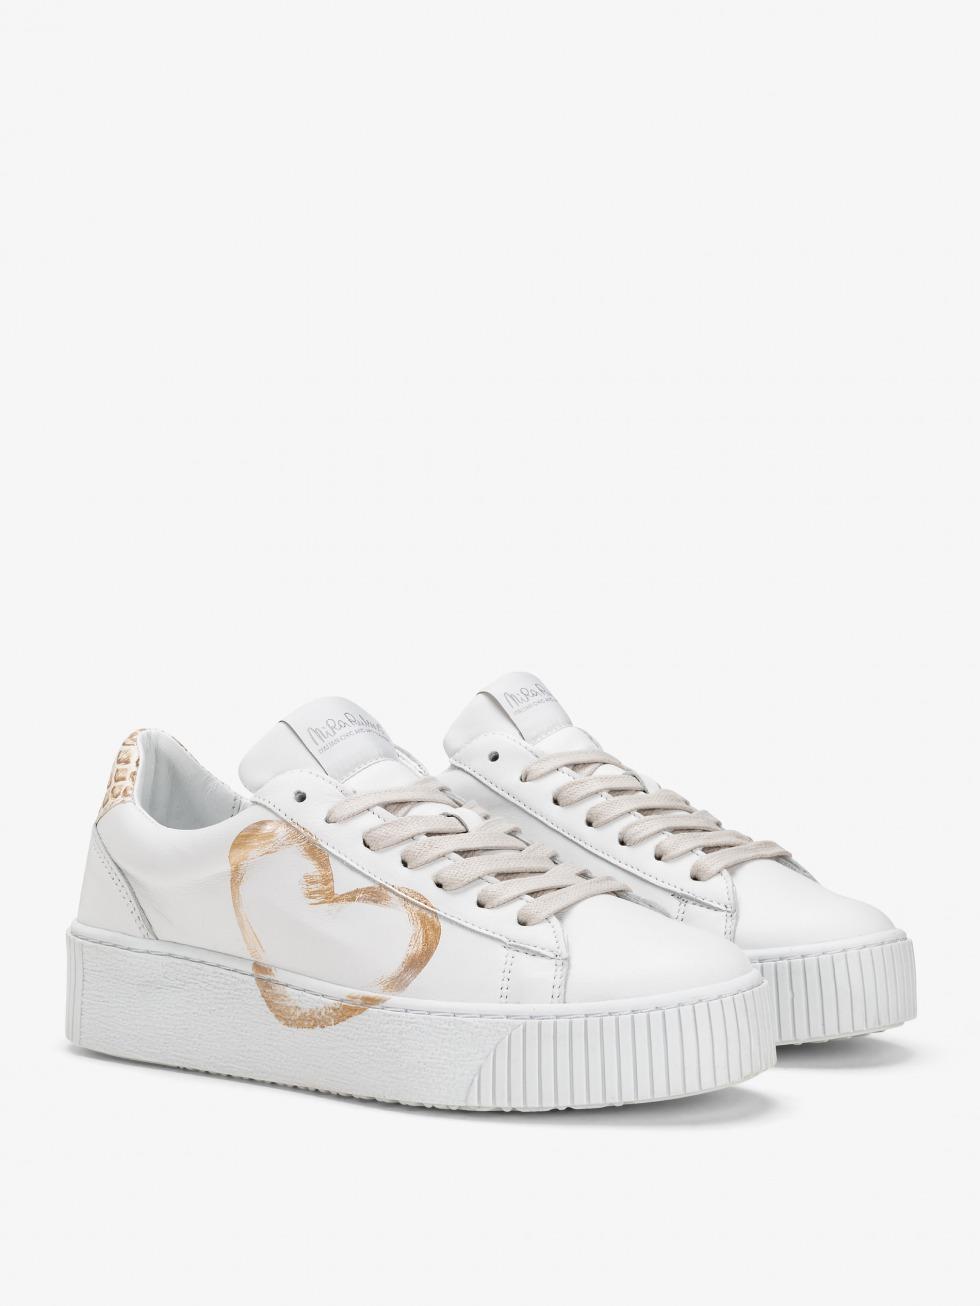 Cosmopolitan Sneakers - Desert Heart